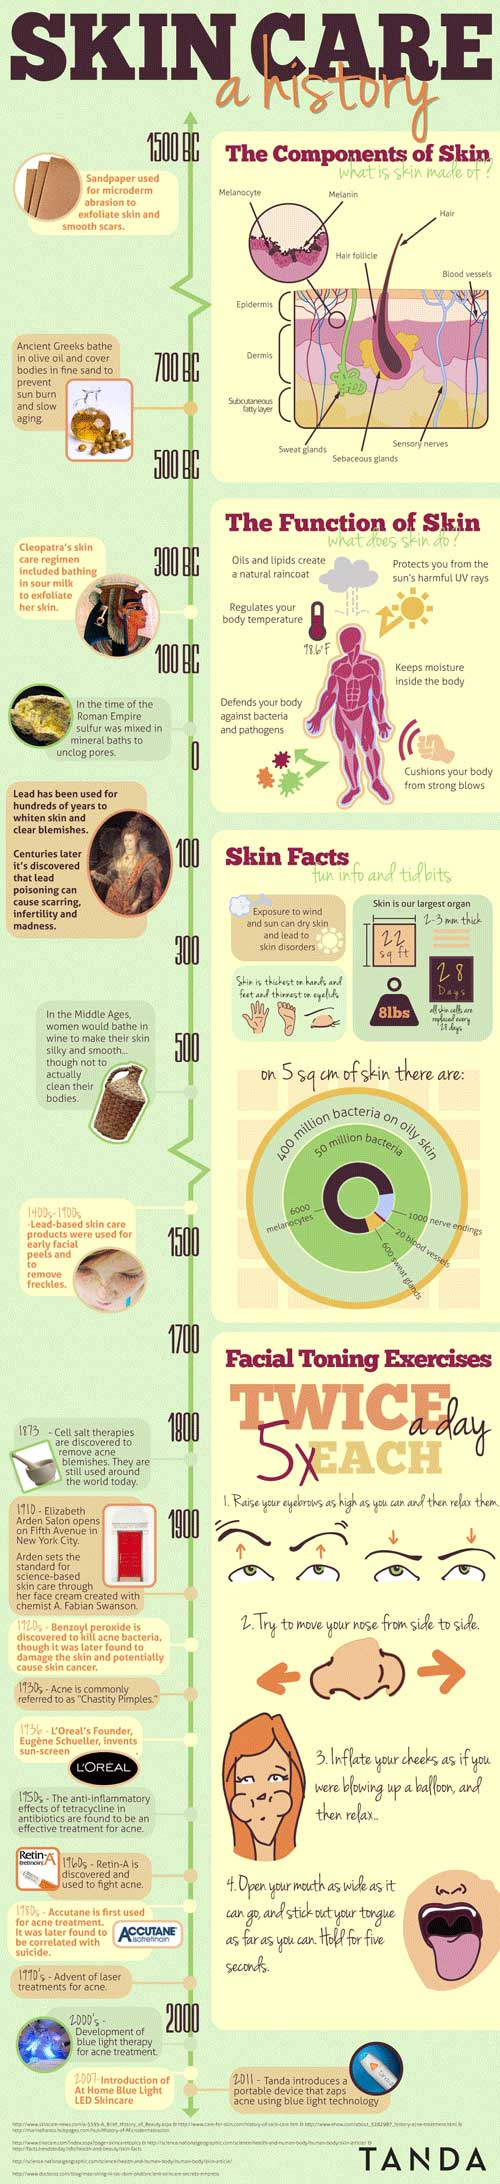 Skin_Care_History2